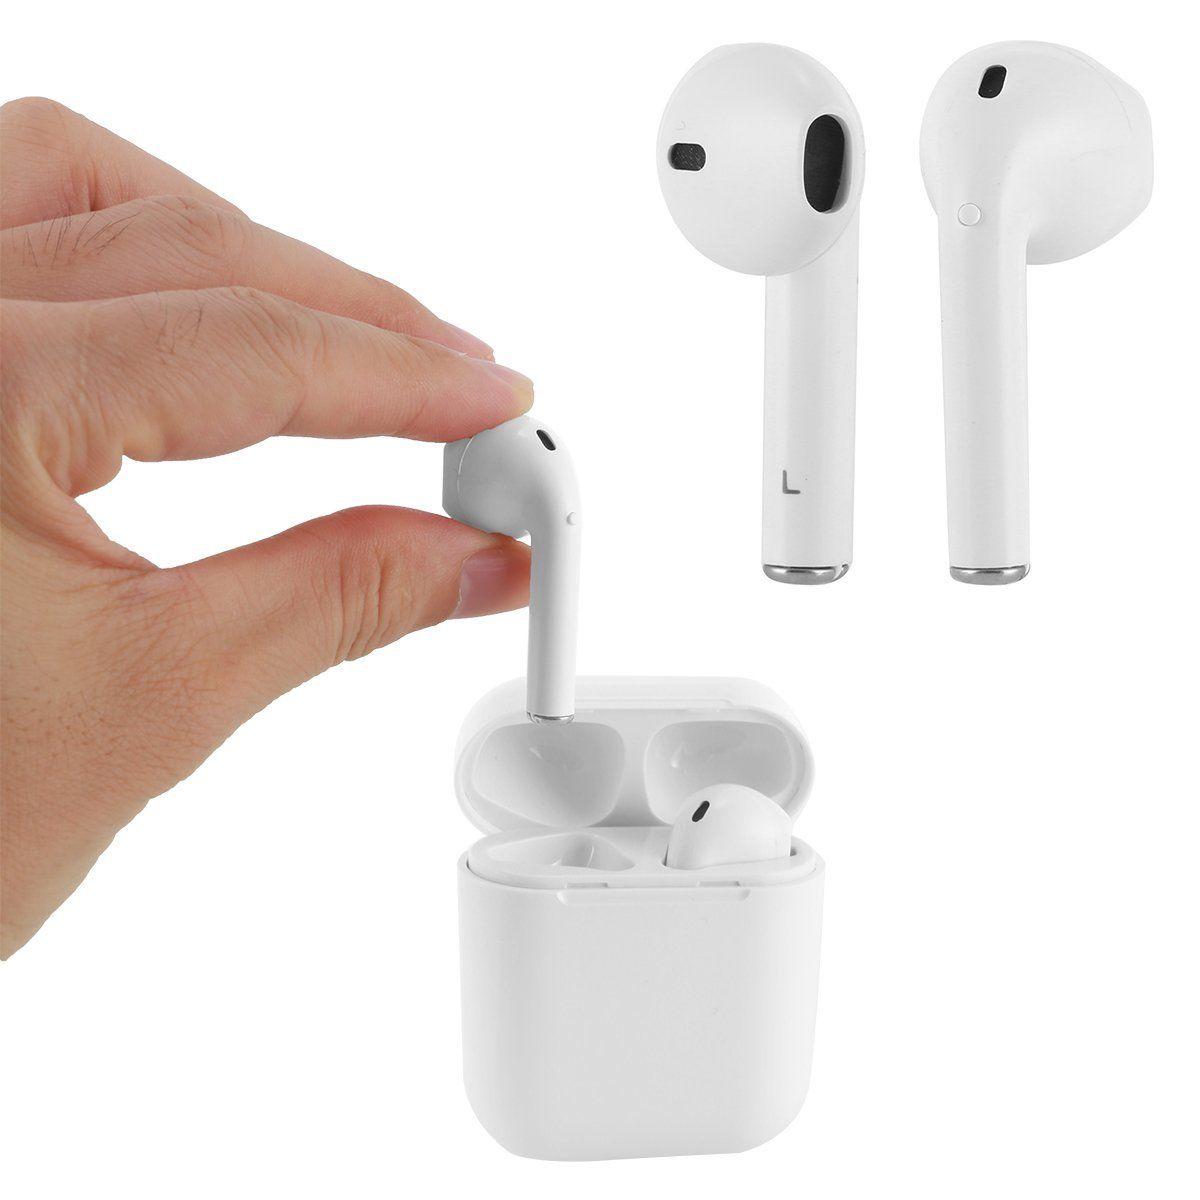 Iphone 8 earbuds - iphone 8 earbuds original